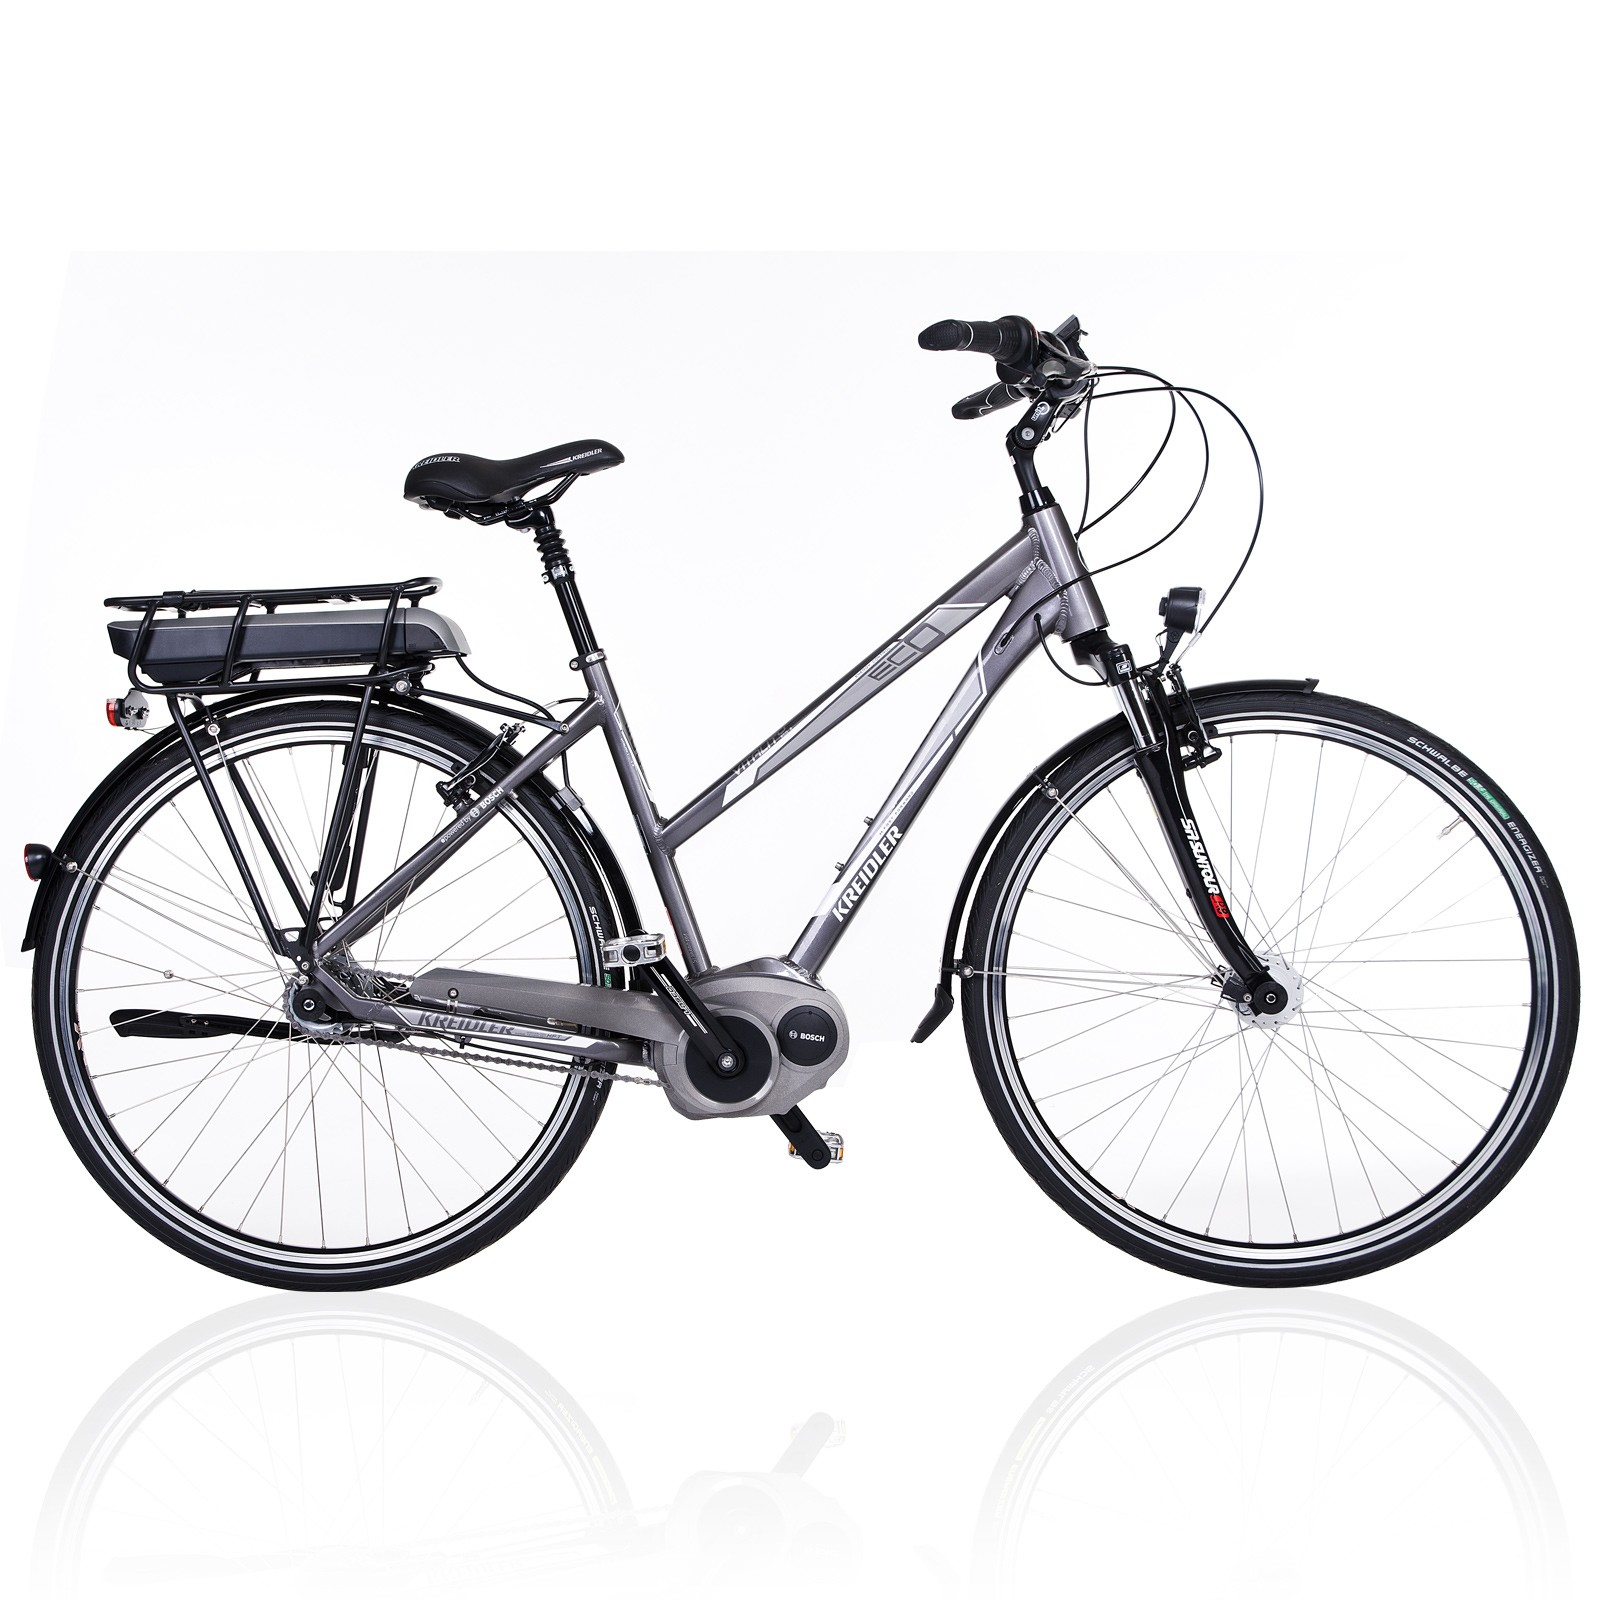 Kreidler E Bike Vitality Eco 2 T Zoid 28 Inch